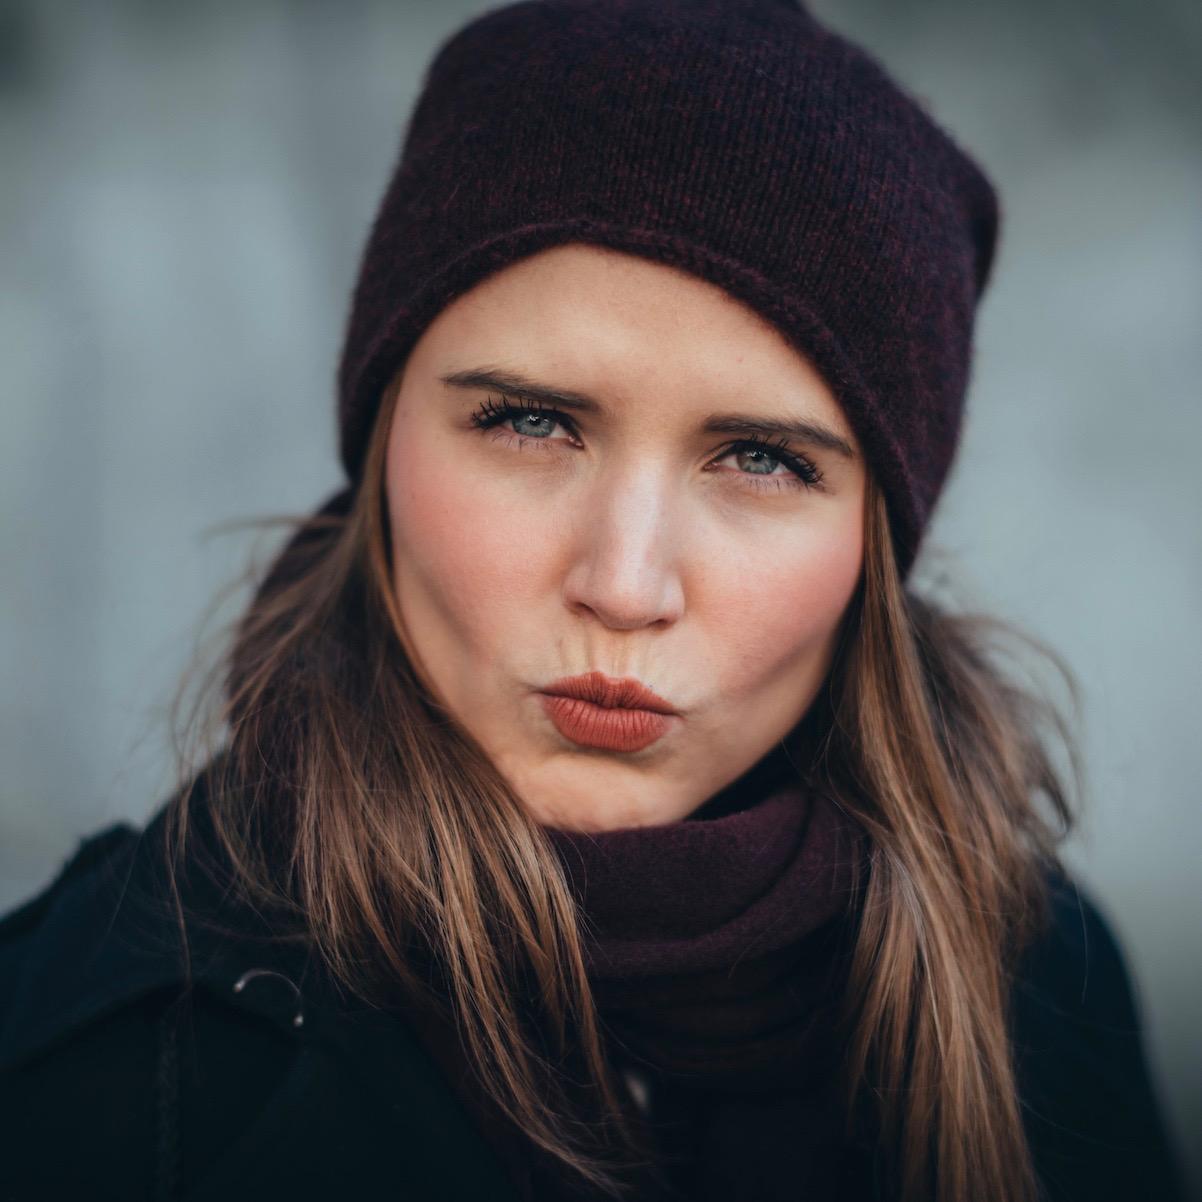 blogger-alltag suelovesnyc_sue_loves_nyc_blog_hamburg_outtake_blogger_alltag_bts (1)